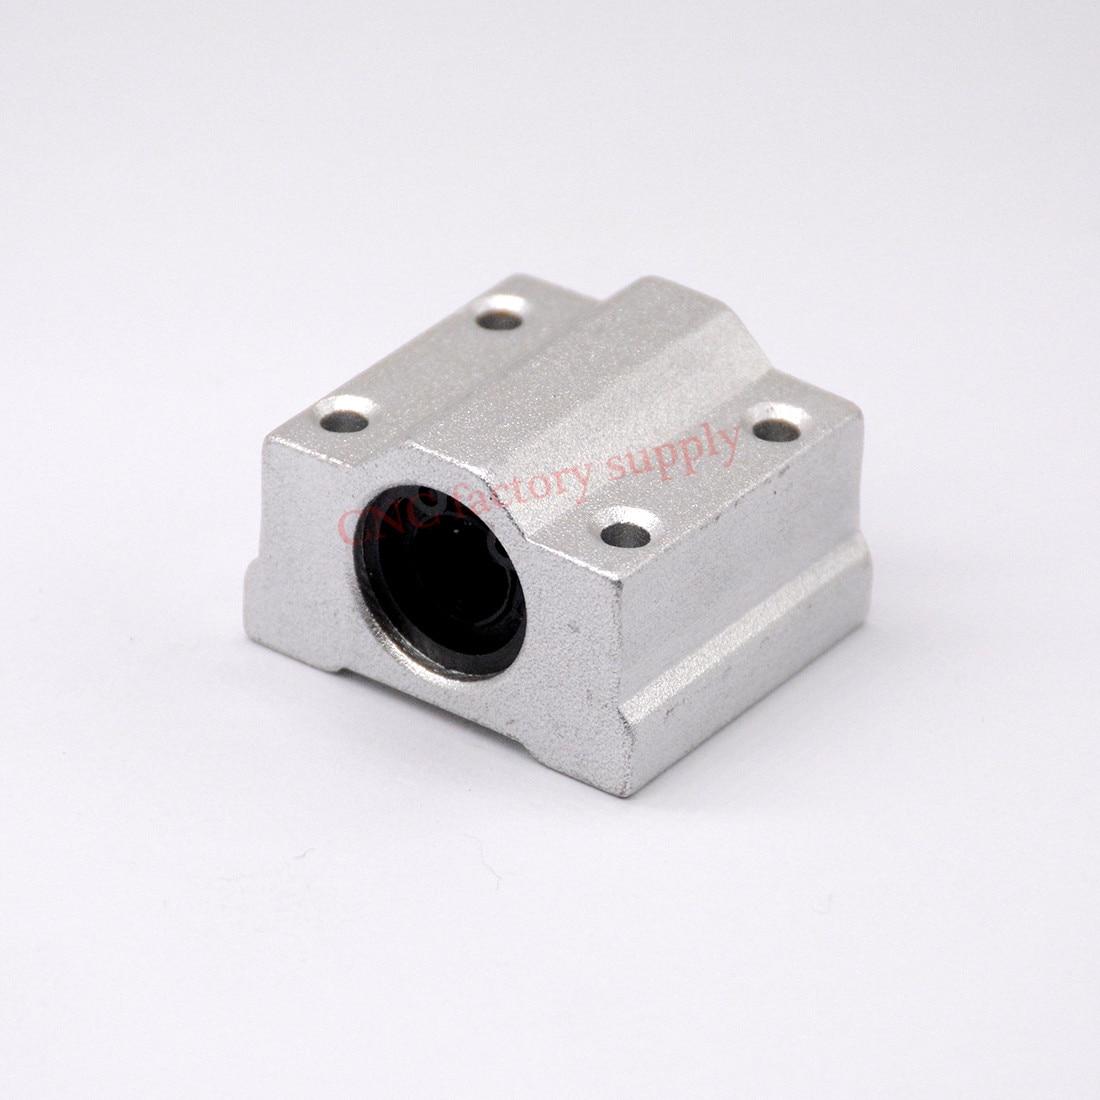 HOT sale 1pc SC8UU SCS8UU 8mm Linear Ball Bearing Block CNC Router hot sale 1pc lm12uu linear bushing 12mm cnc linear bearings